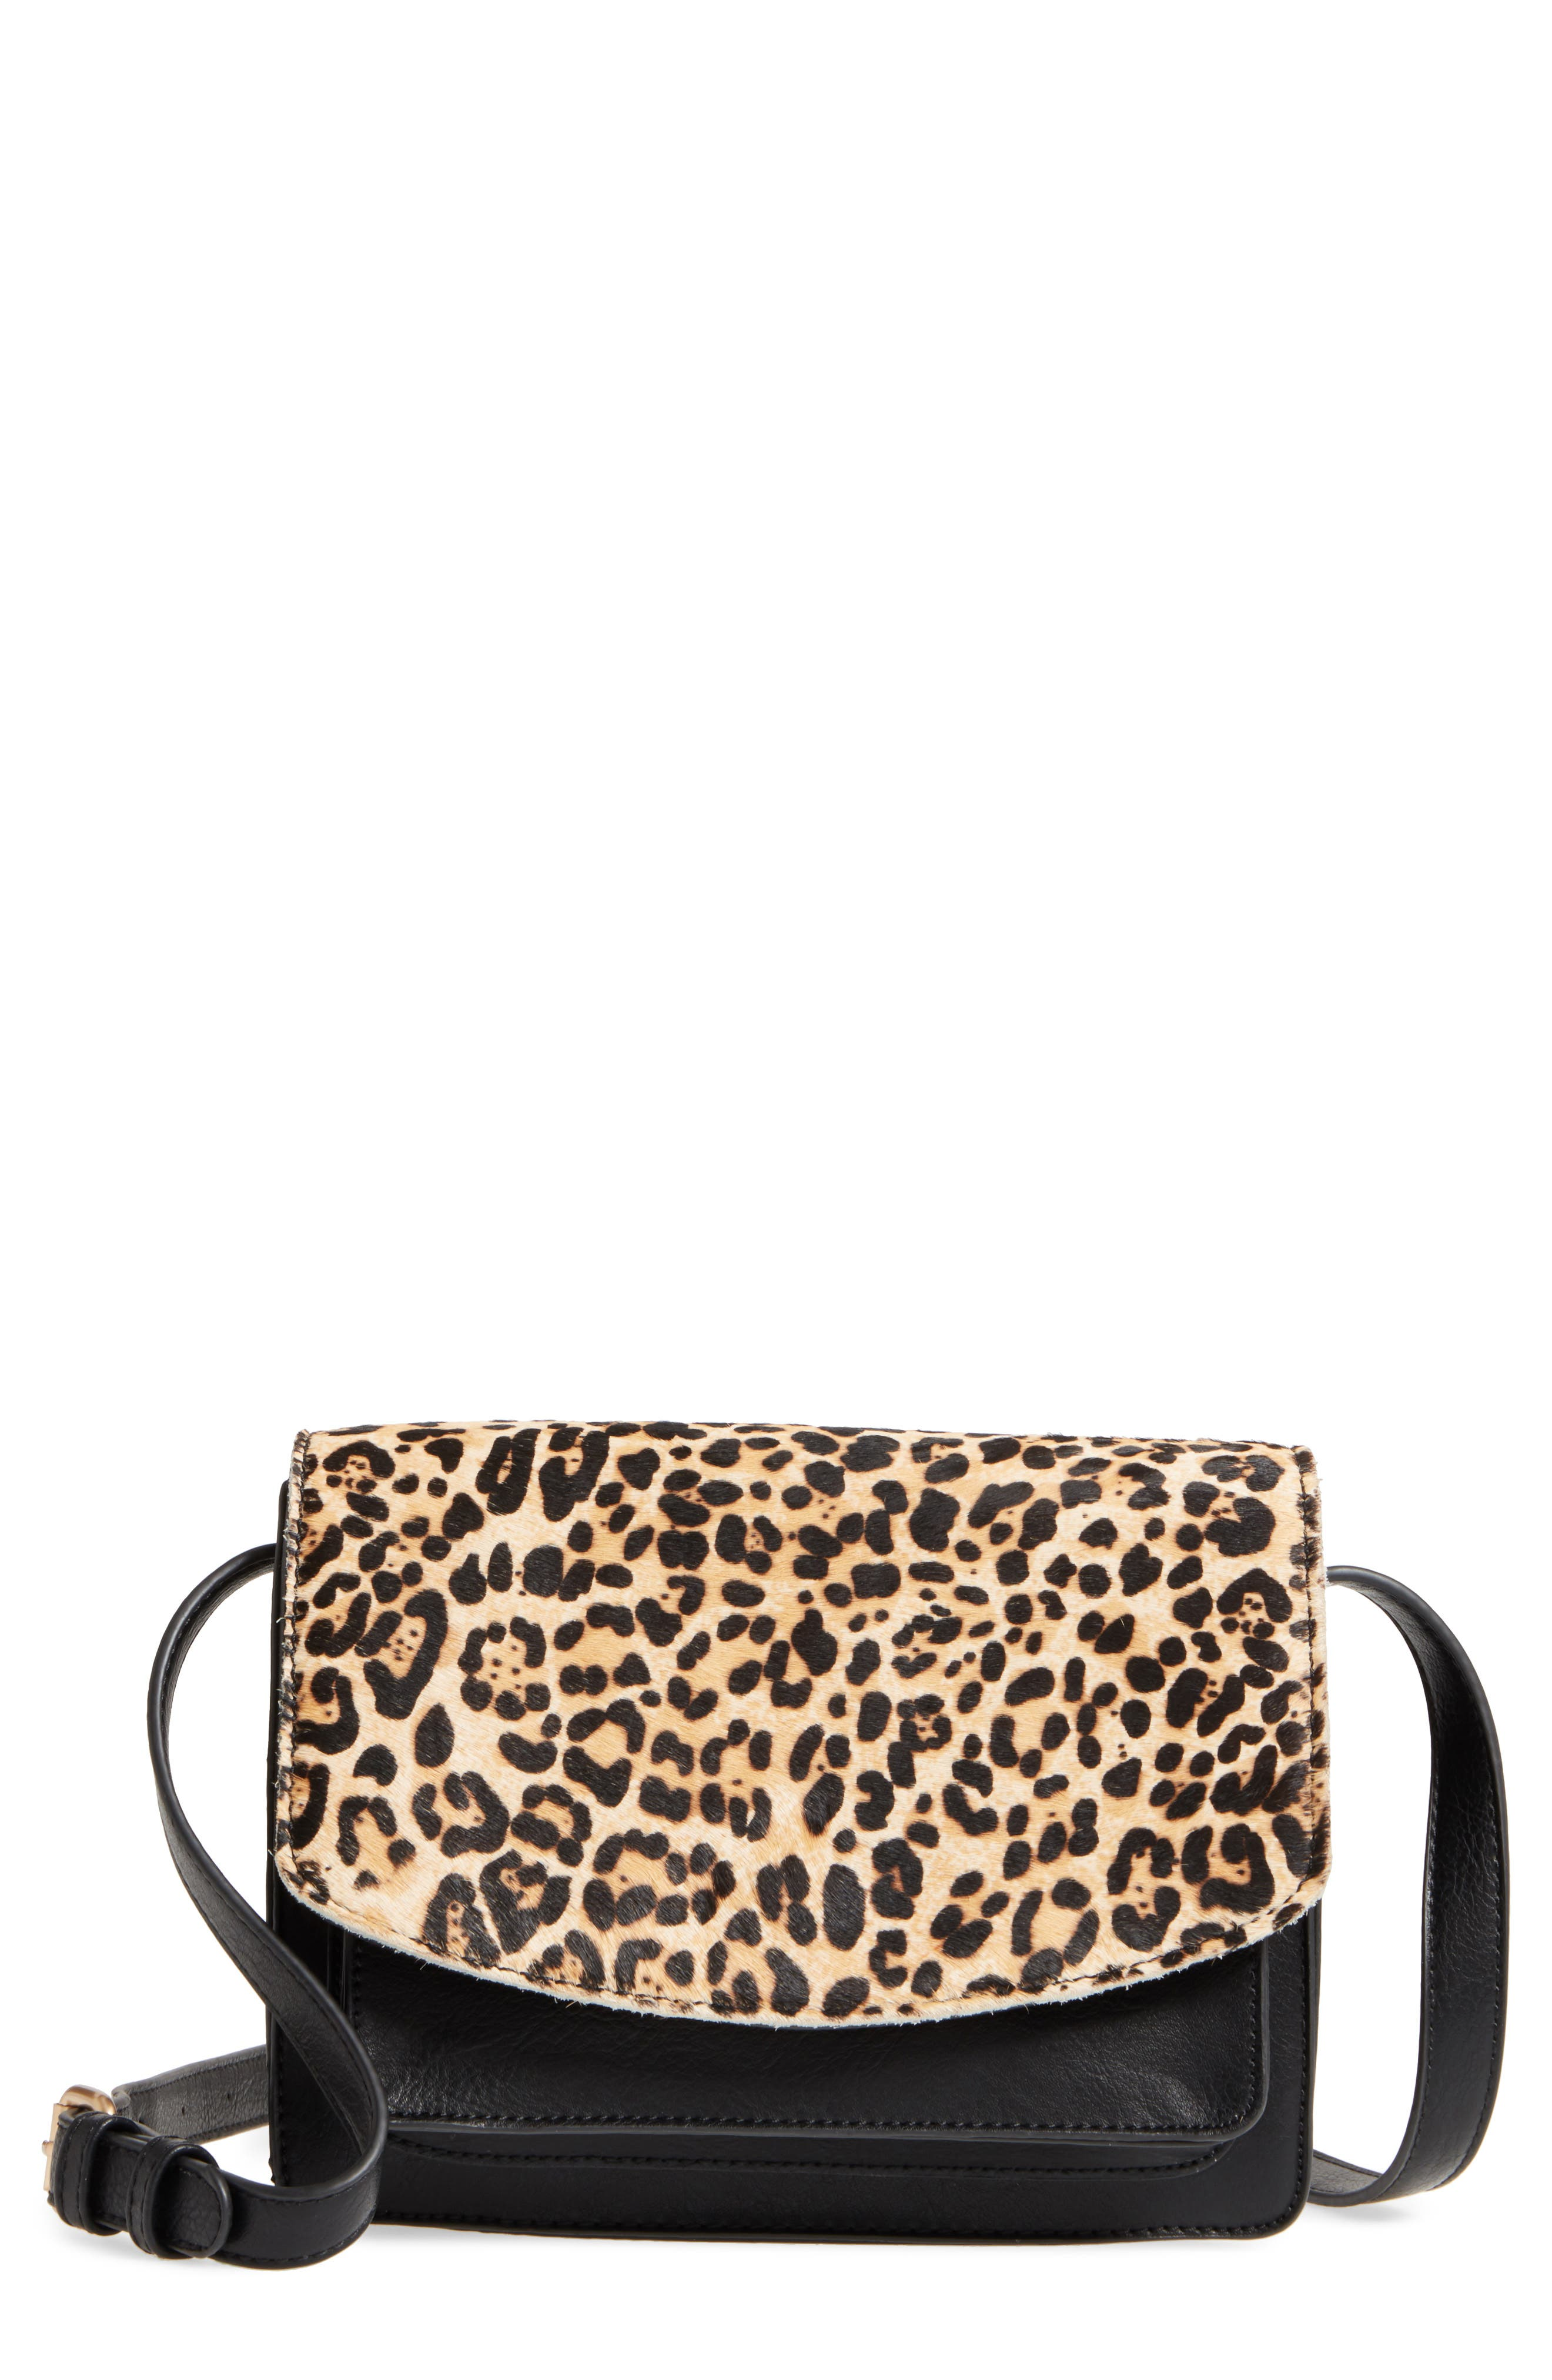 Main Image - Sole Society Michelle Genuine Calf Hair Flap Crossbody Bag